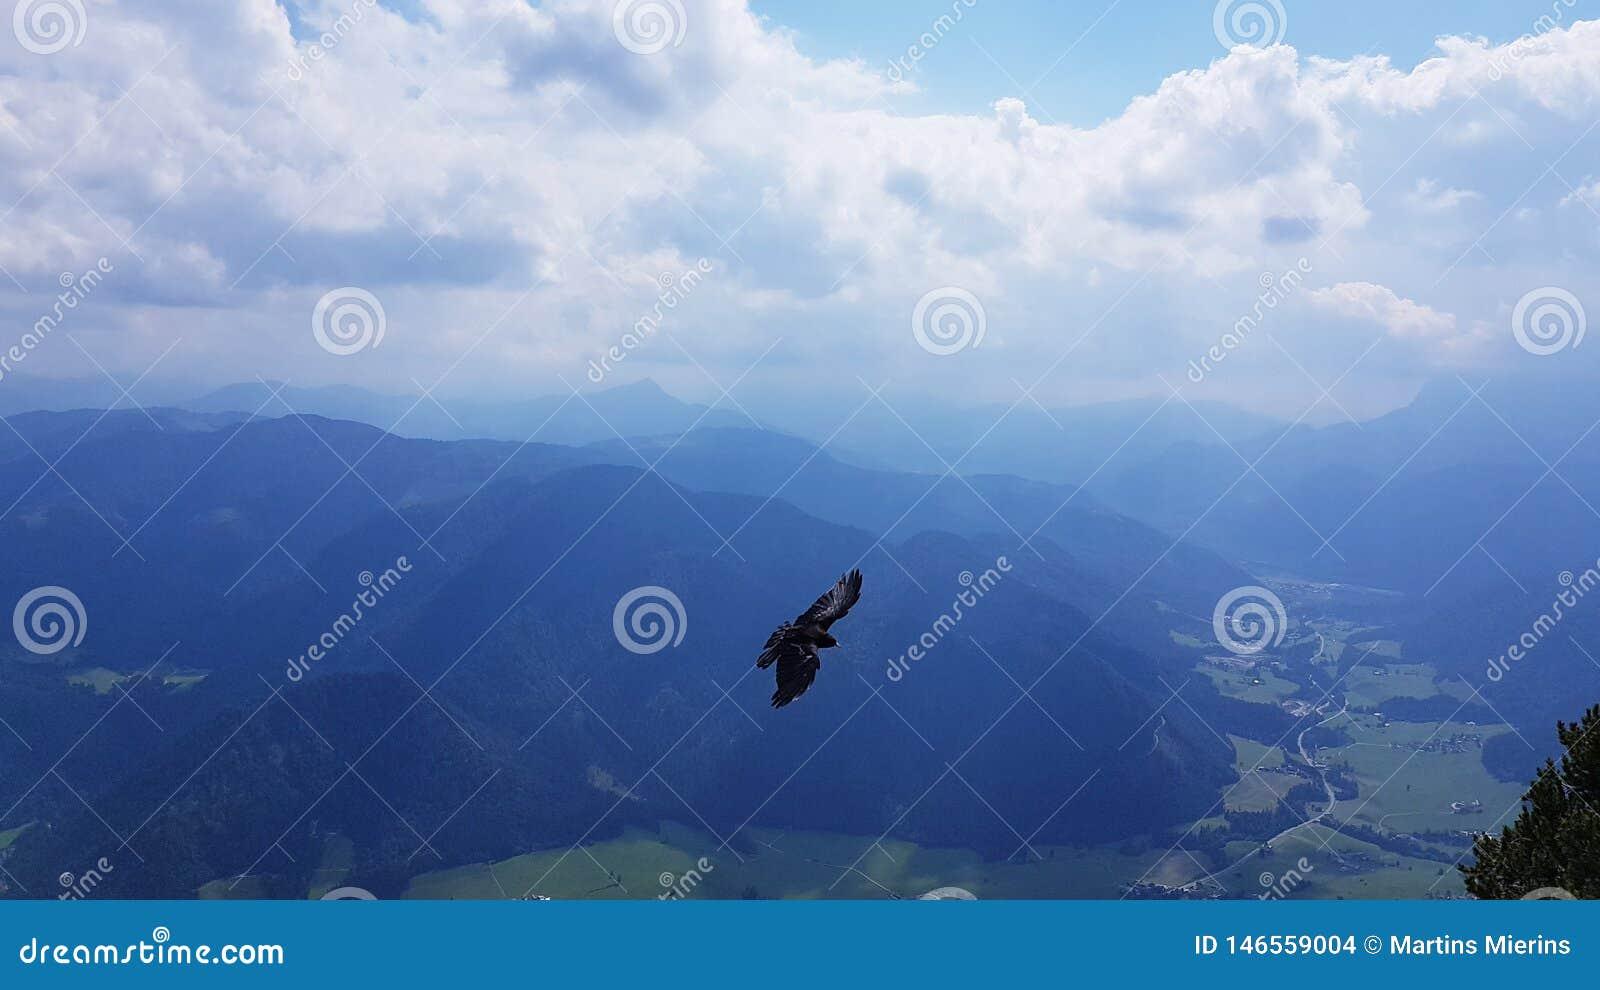 Bird between the big mountains